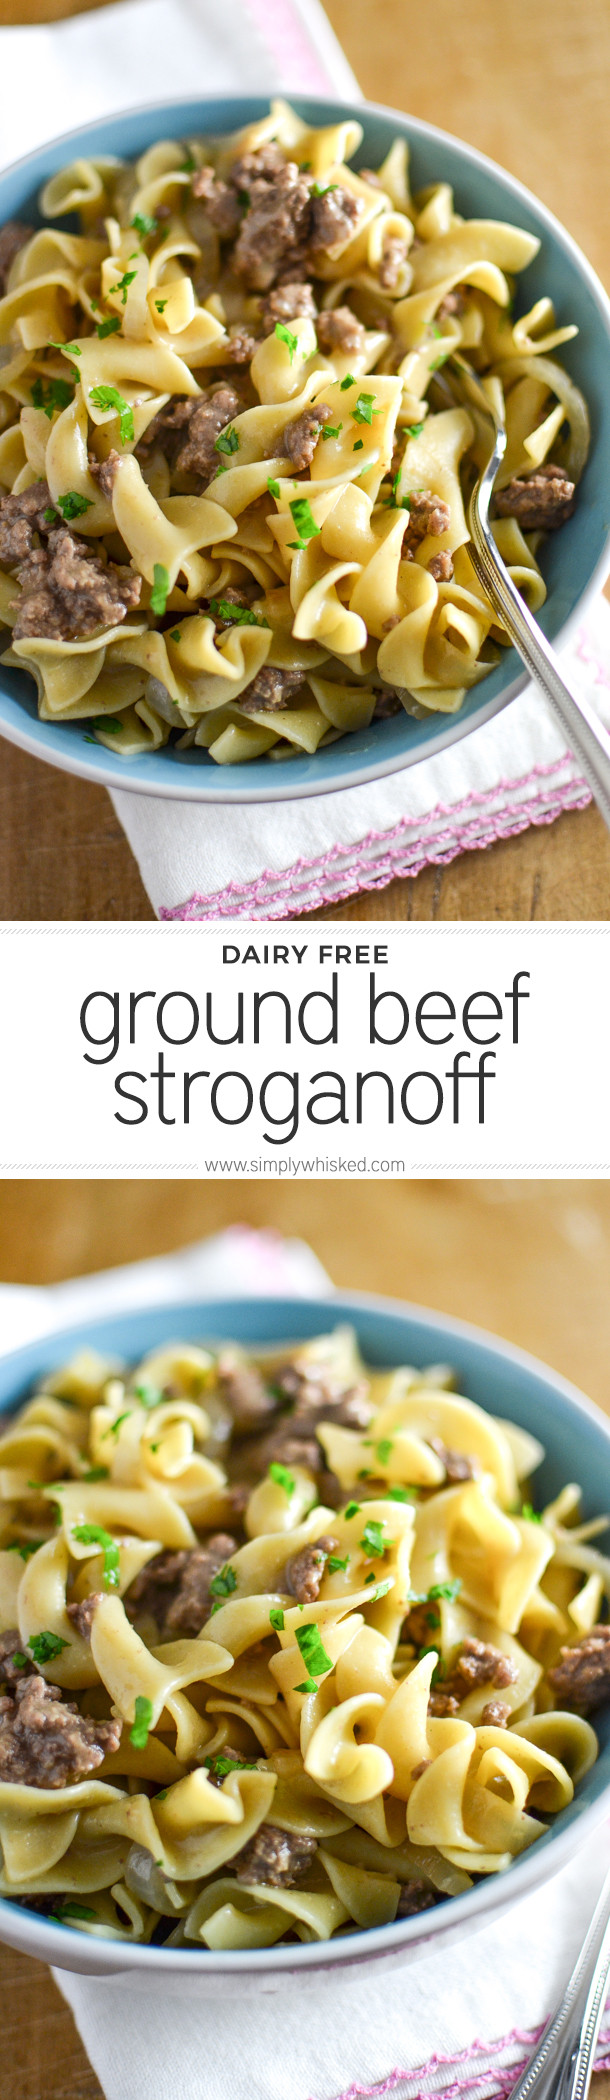 Dairy Free Beef Stroganoff  Ground Beef Stroganoff Simply Whisked